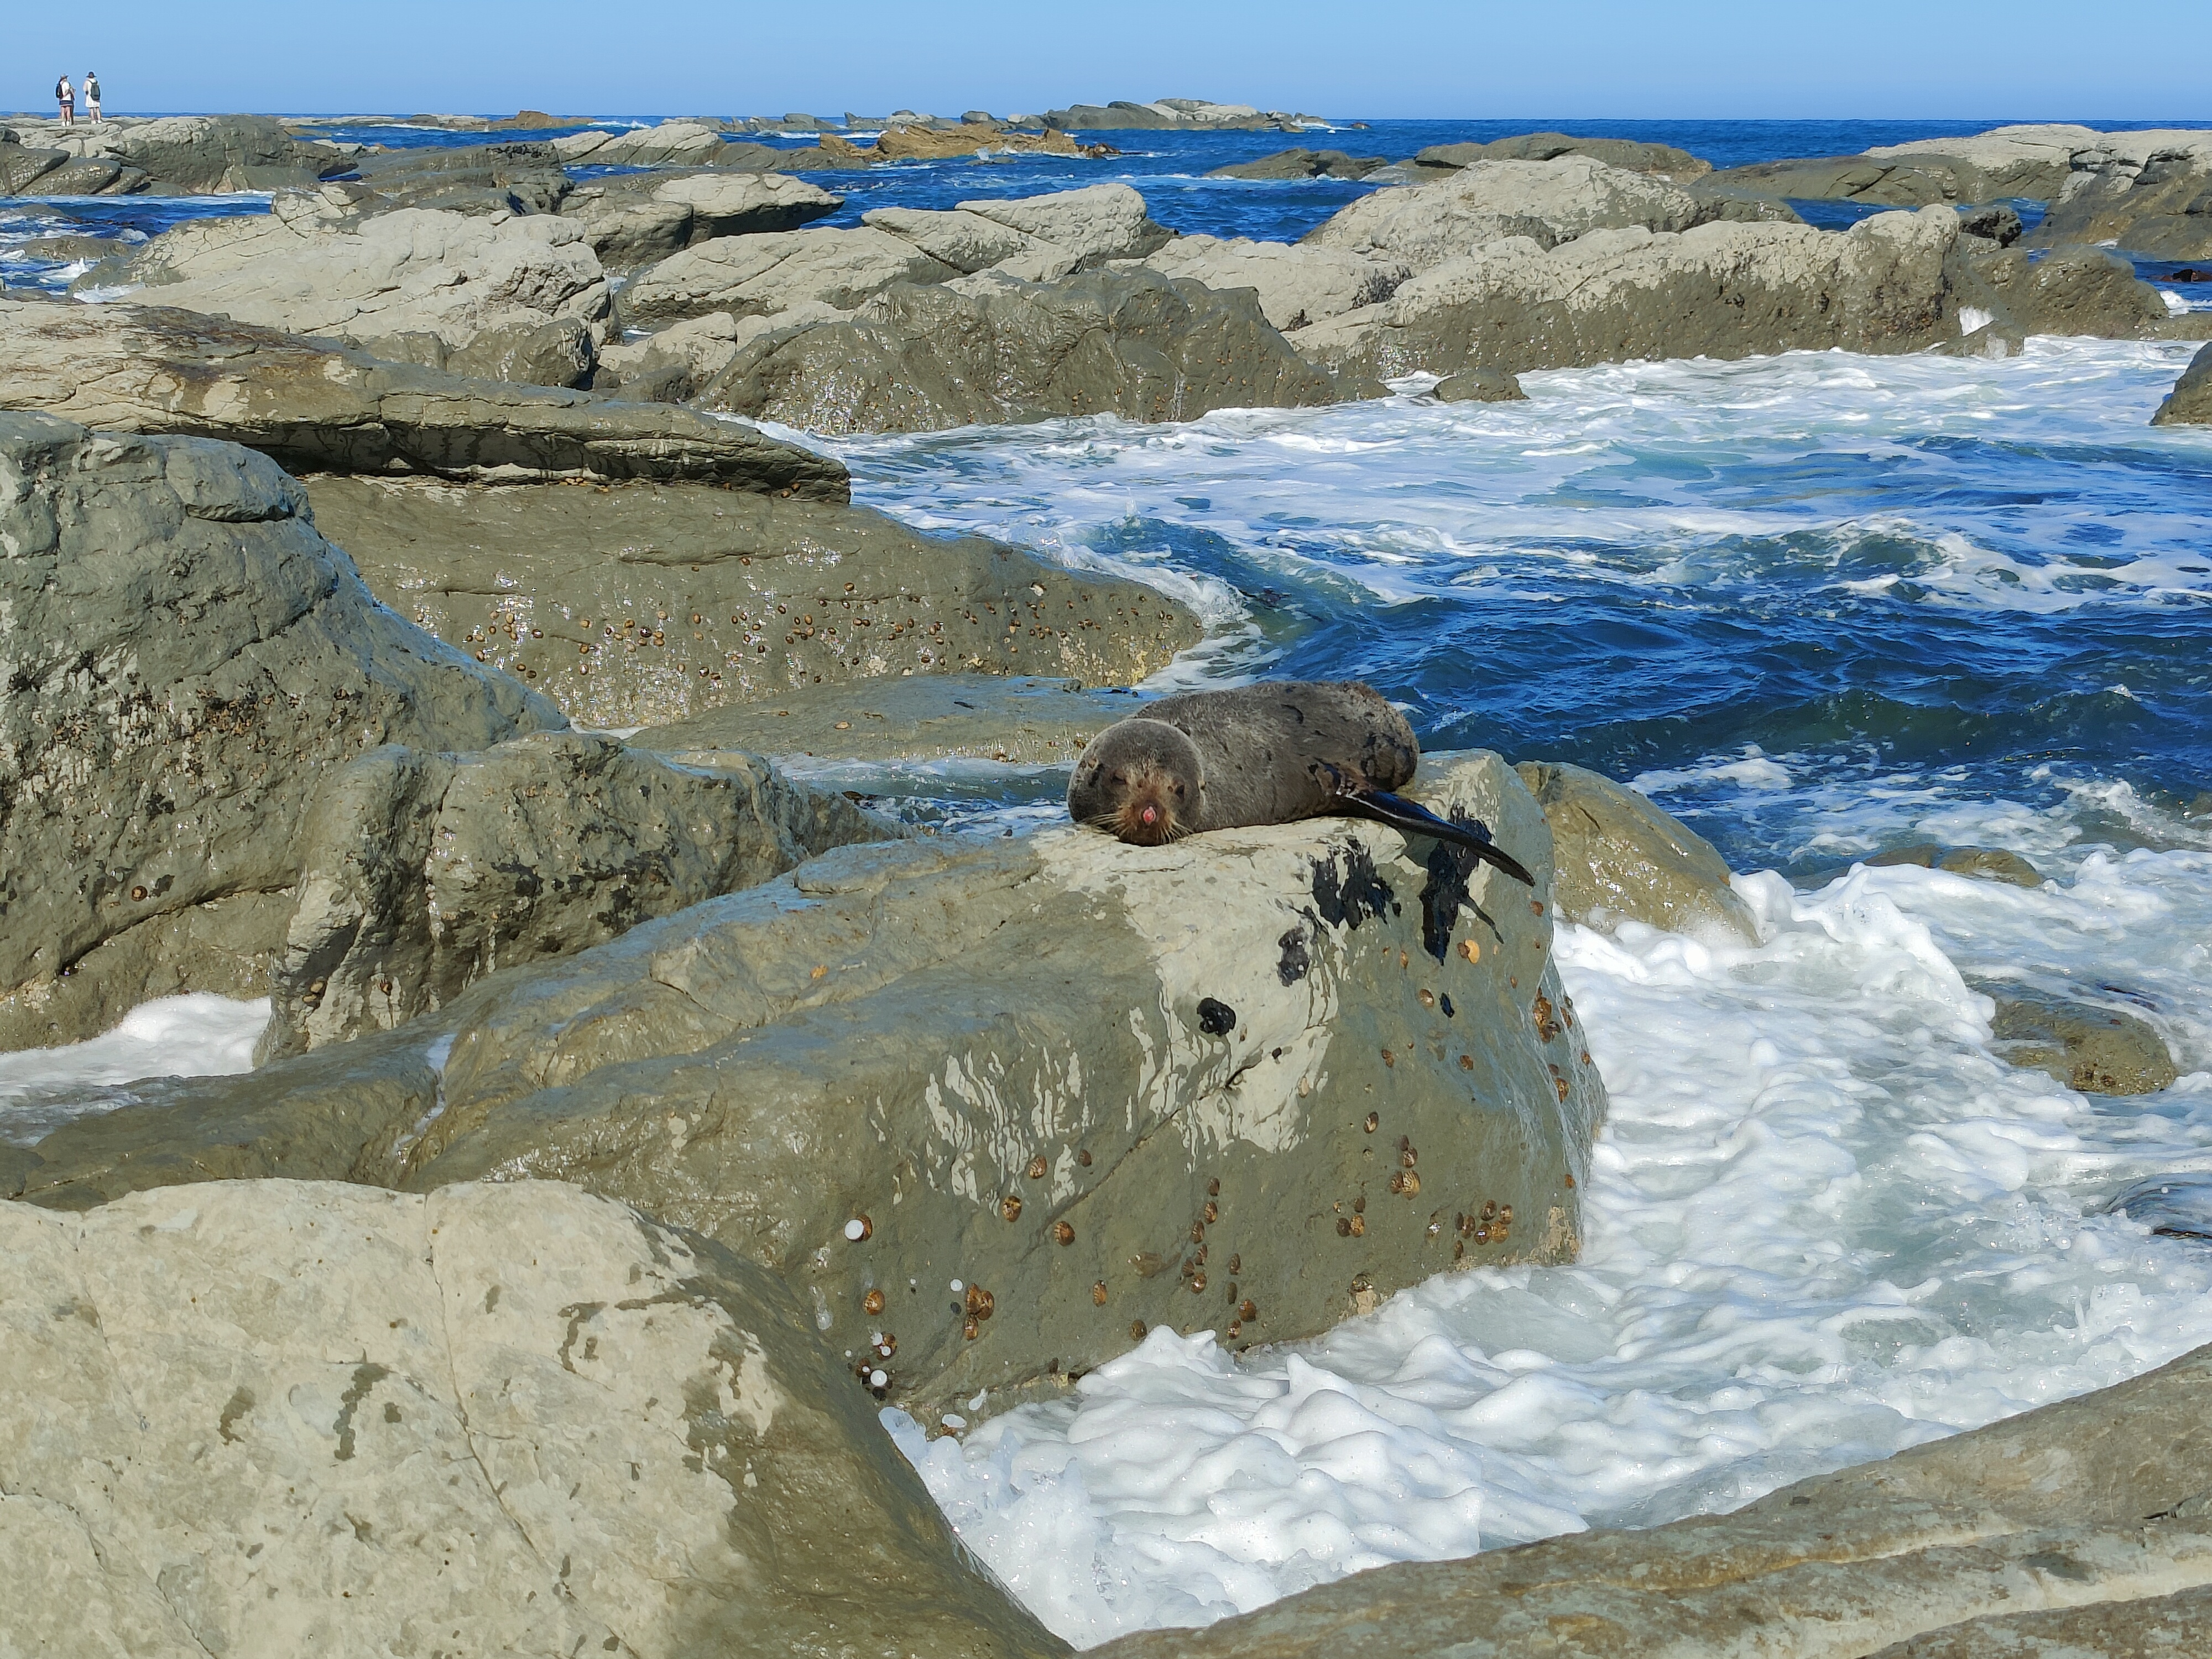 A seal dozing in the sun